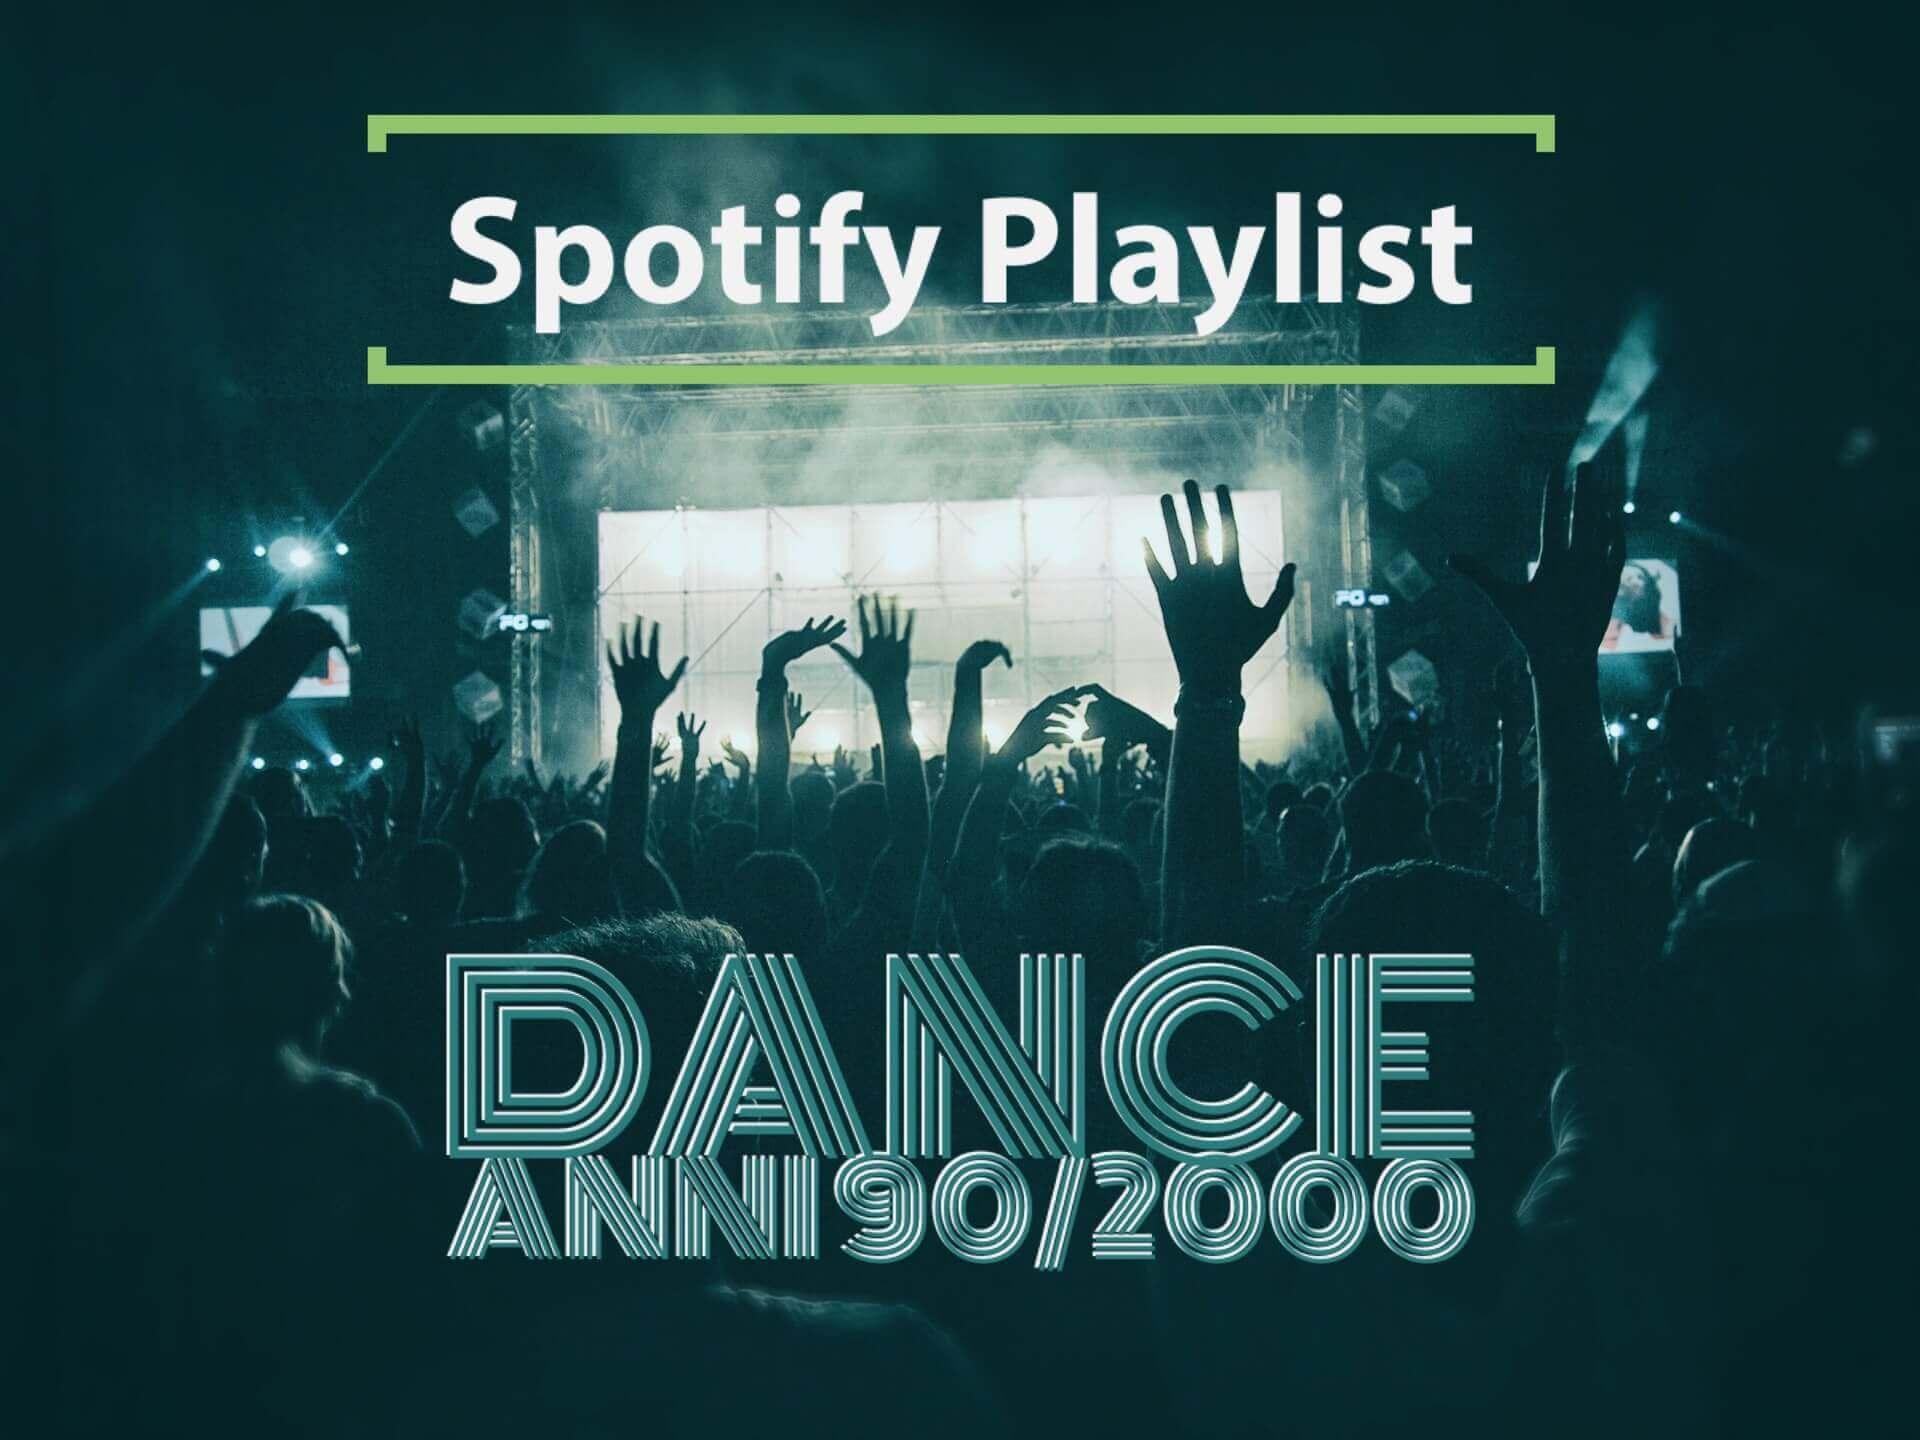 anni 90-2000 disco on Spotify